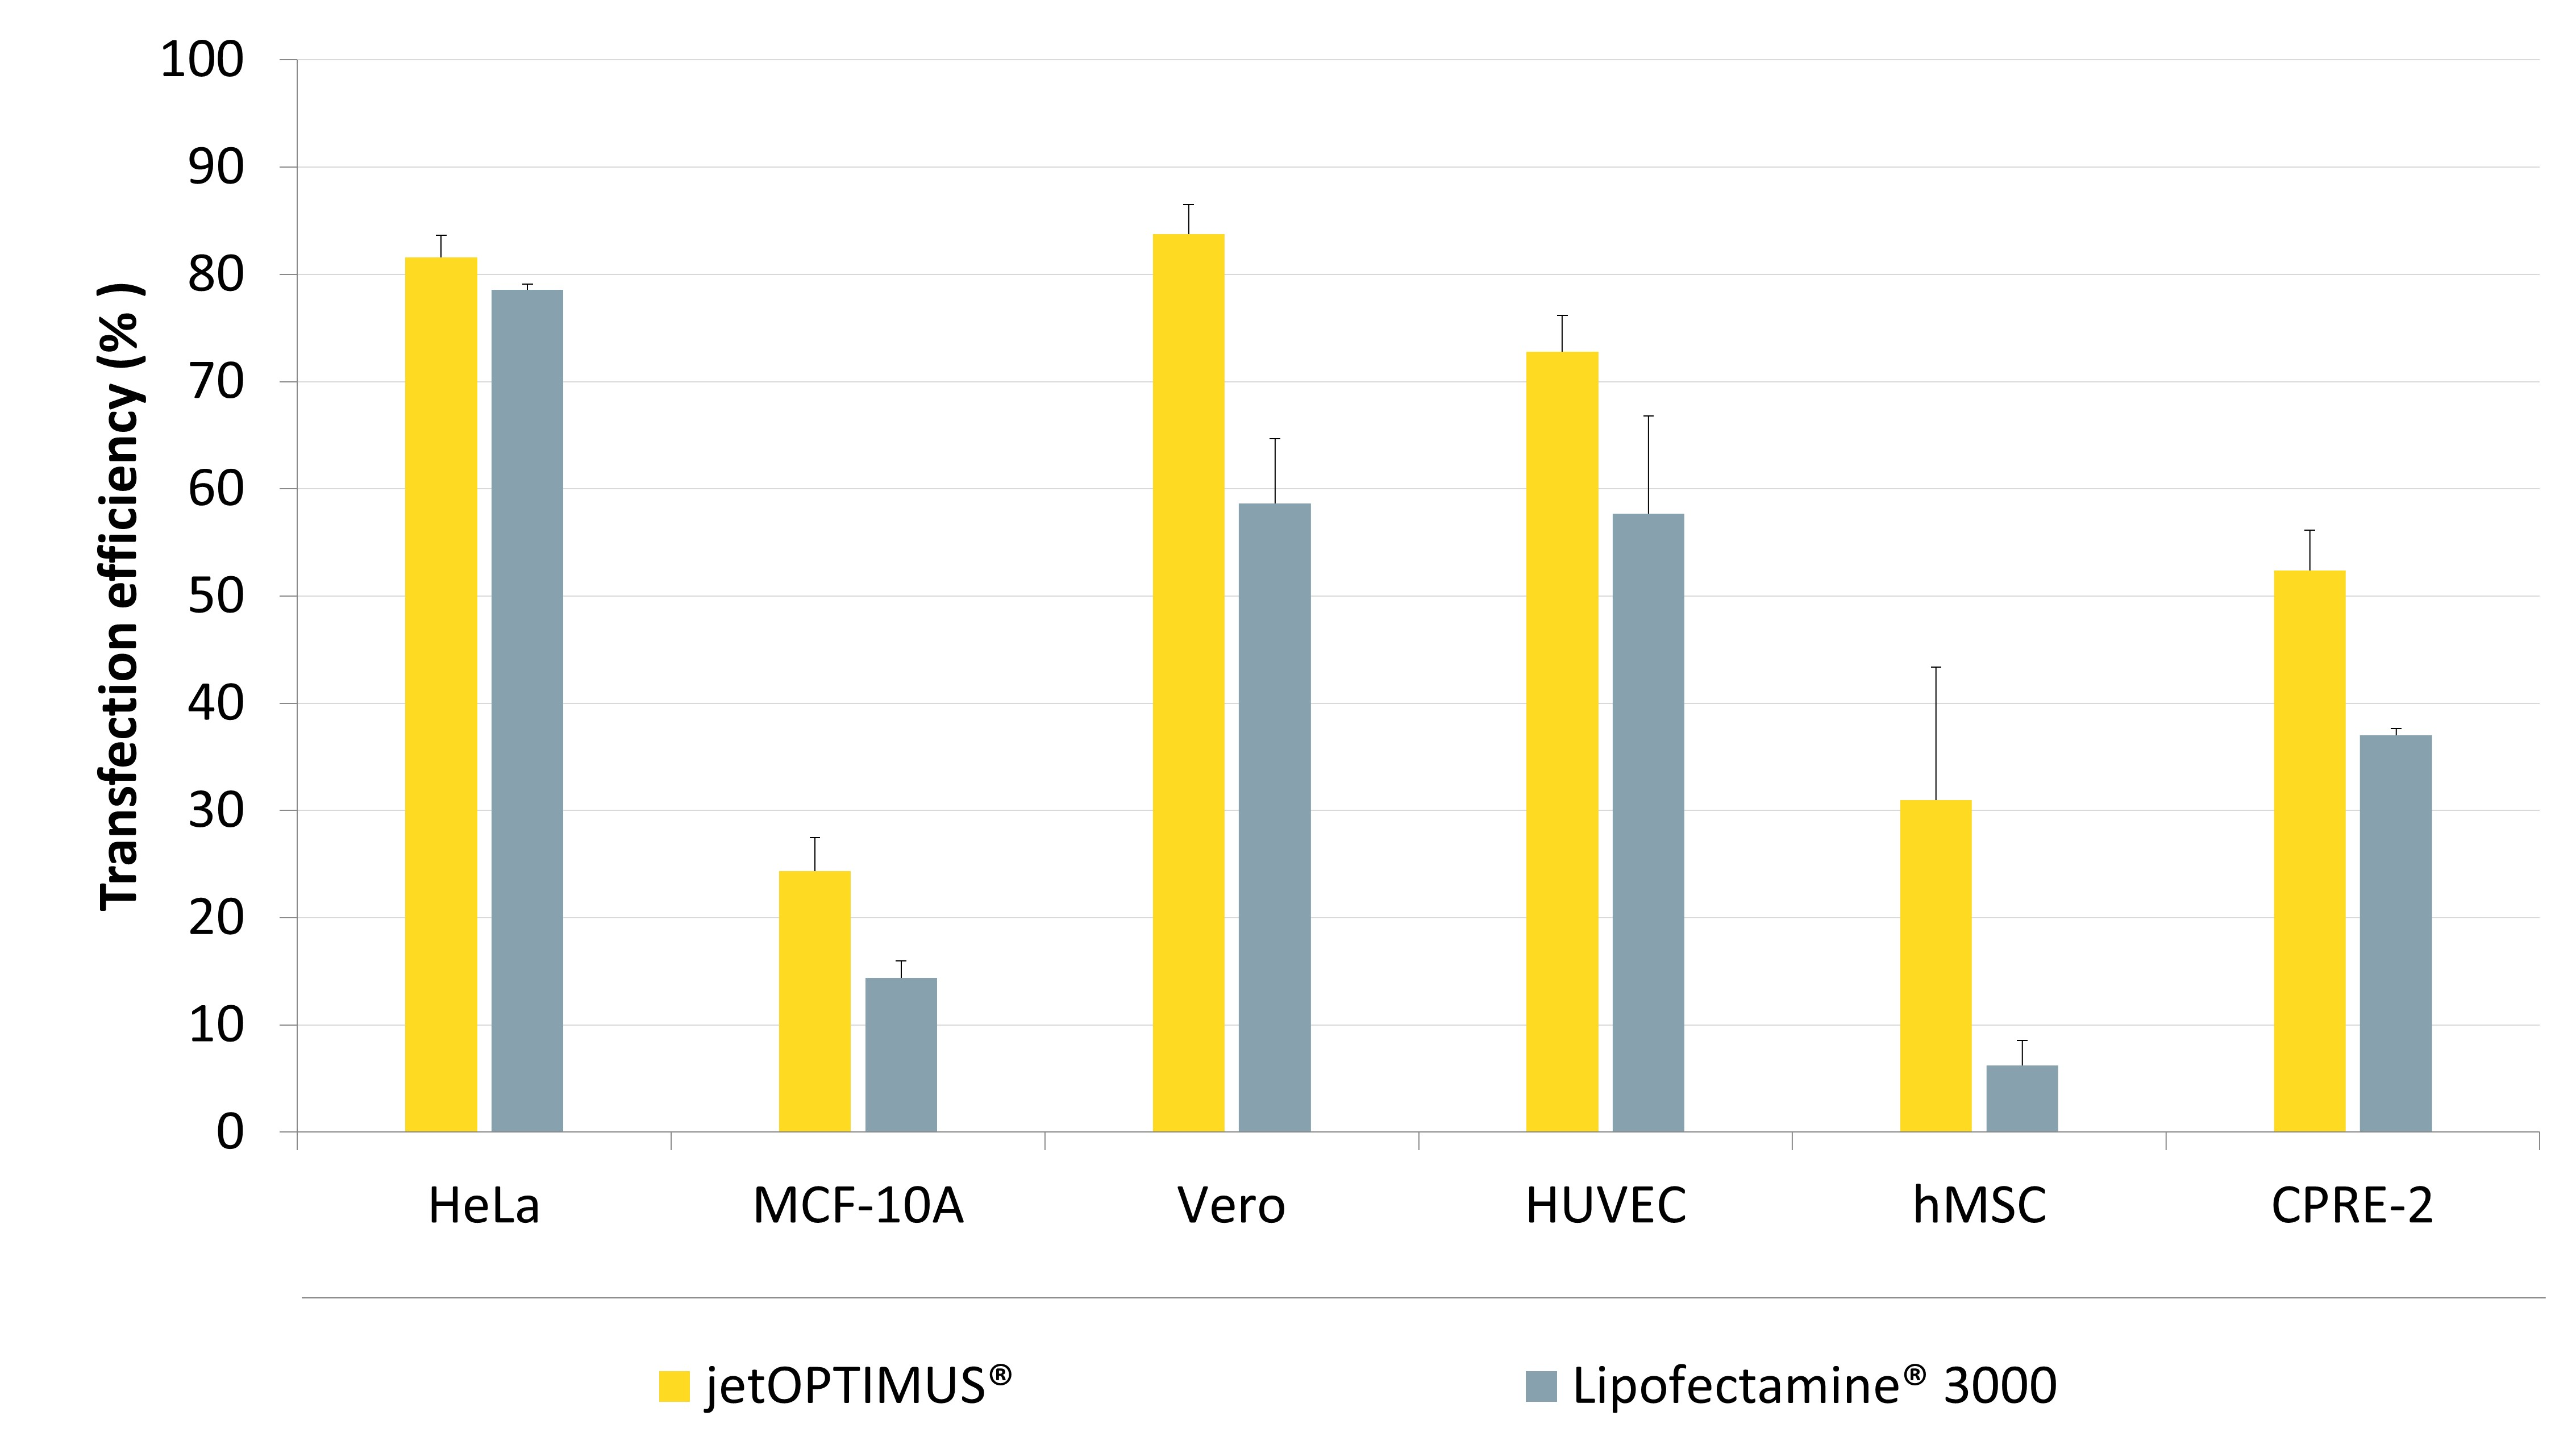 jetOPTIMUS - Maximal transfection efficiency